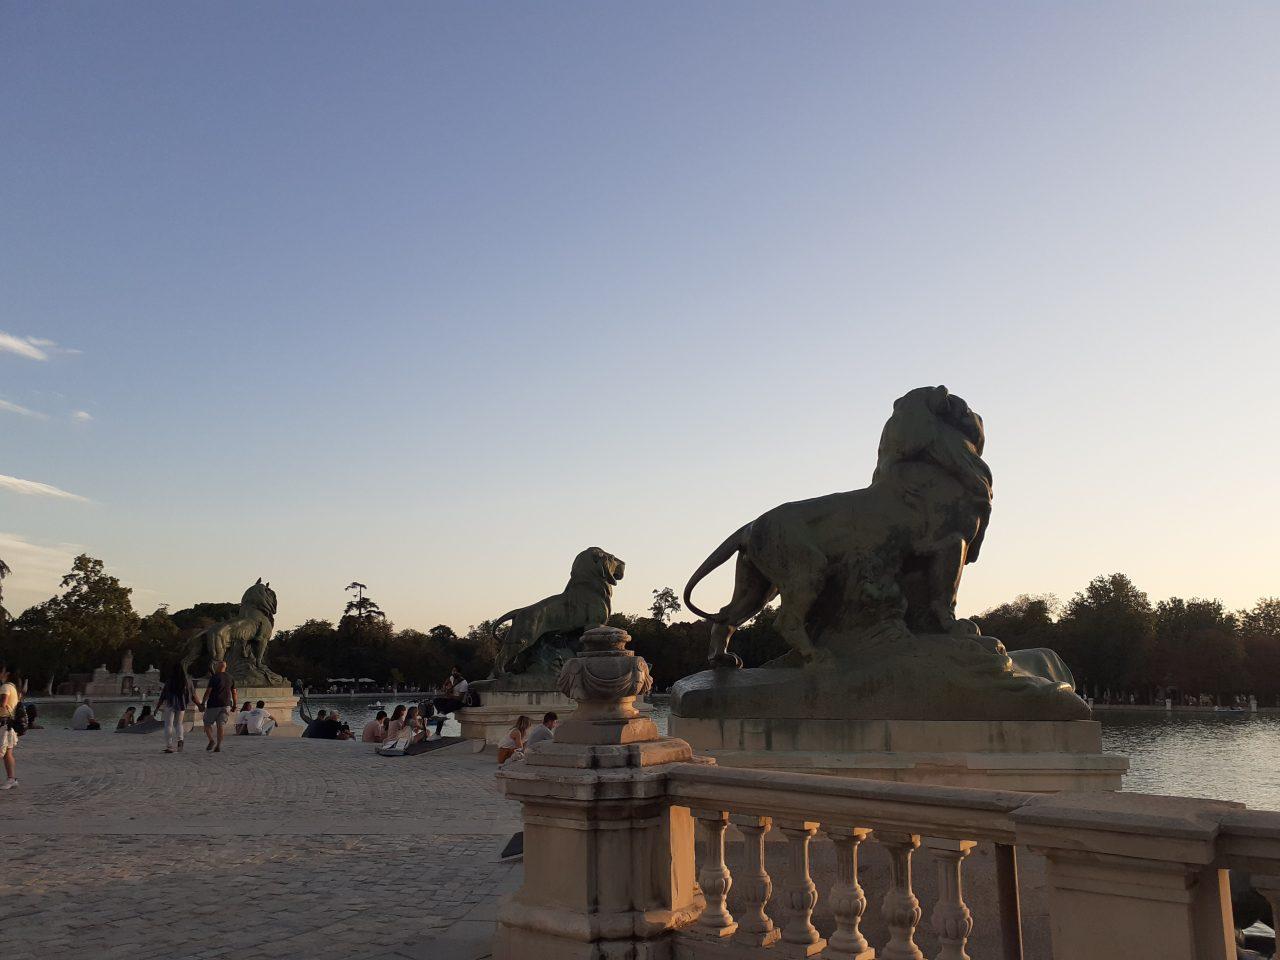 https://www.monicachacin.com/wp-content/uploads/2021/09/reflexiones-para-emprendedores-monica-chacin-copywriter-madrid-parque-retiro-leones-2-1280x960.jpg